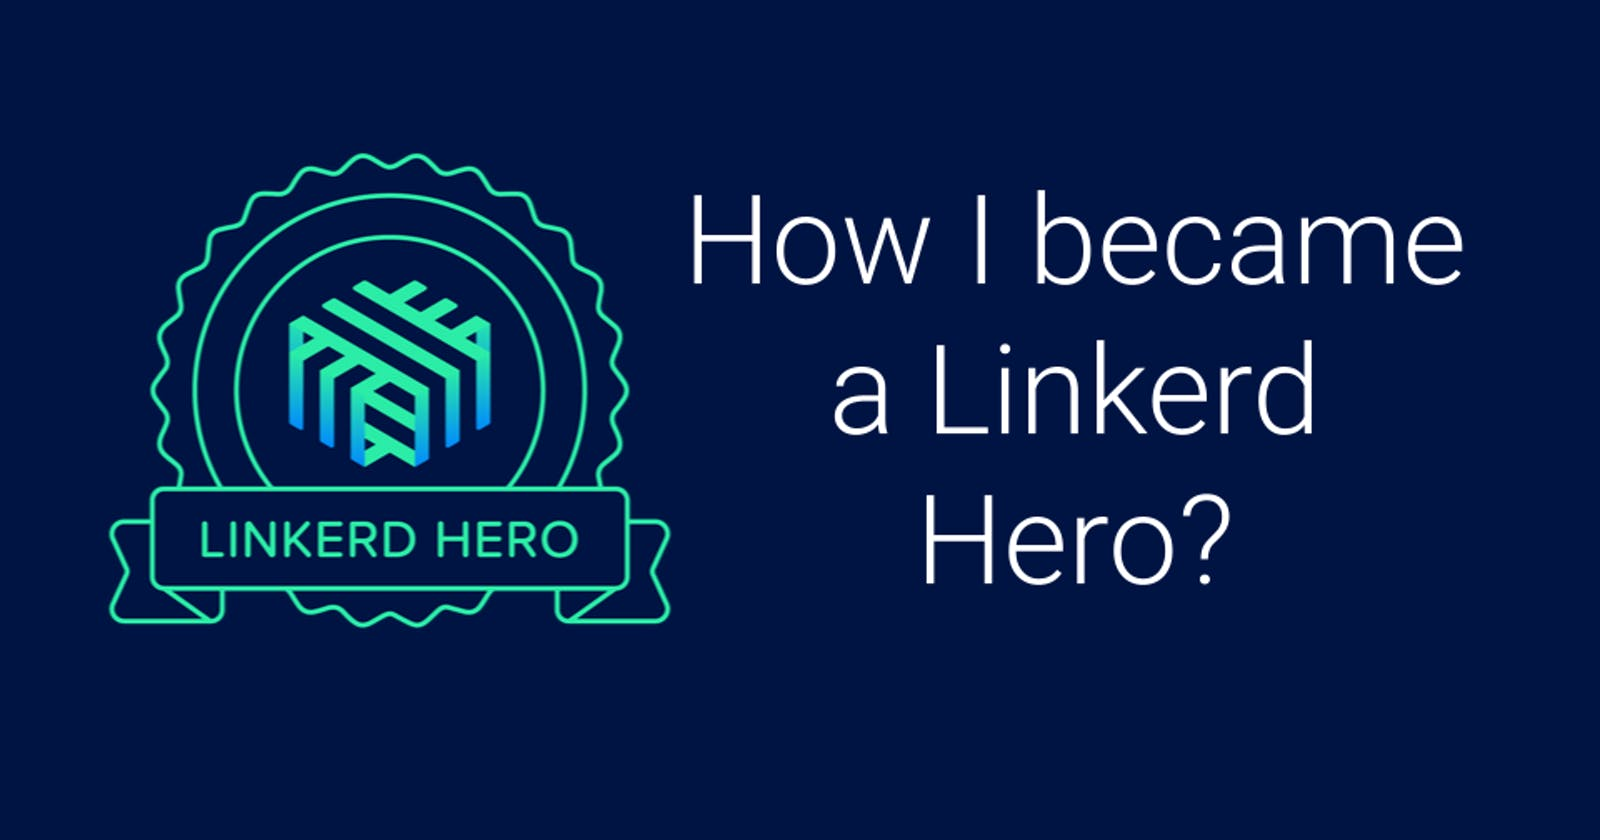 How i became a Linkerd Hero?